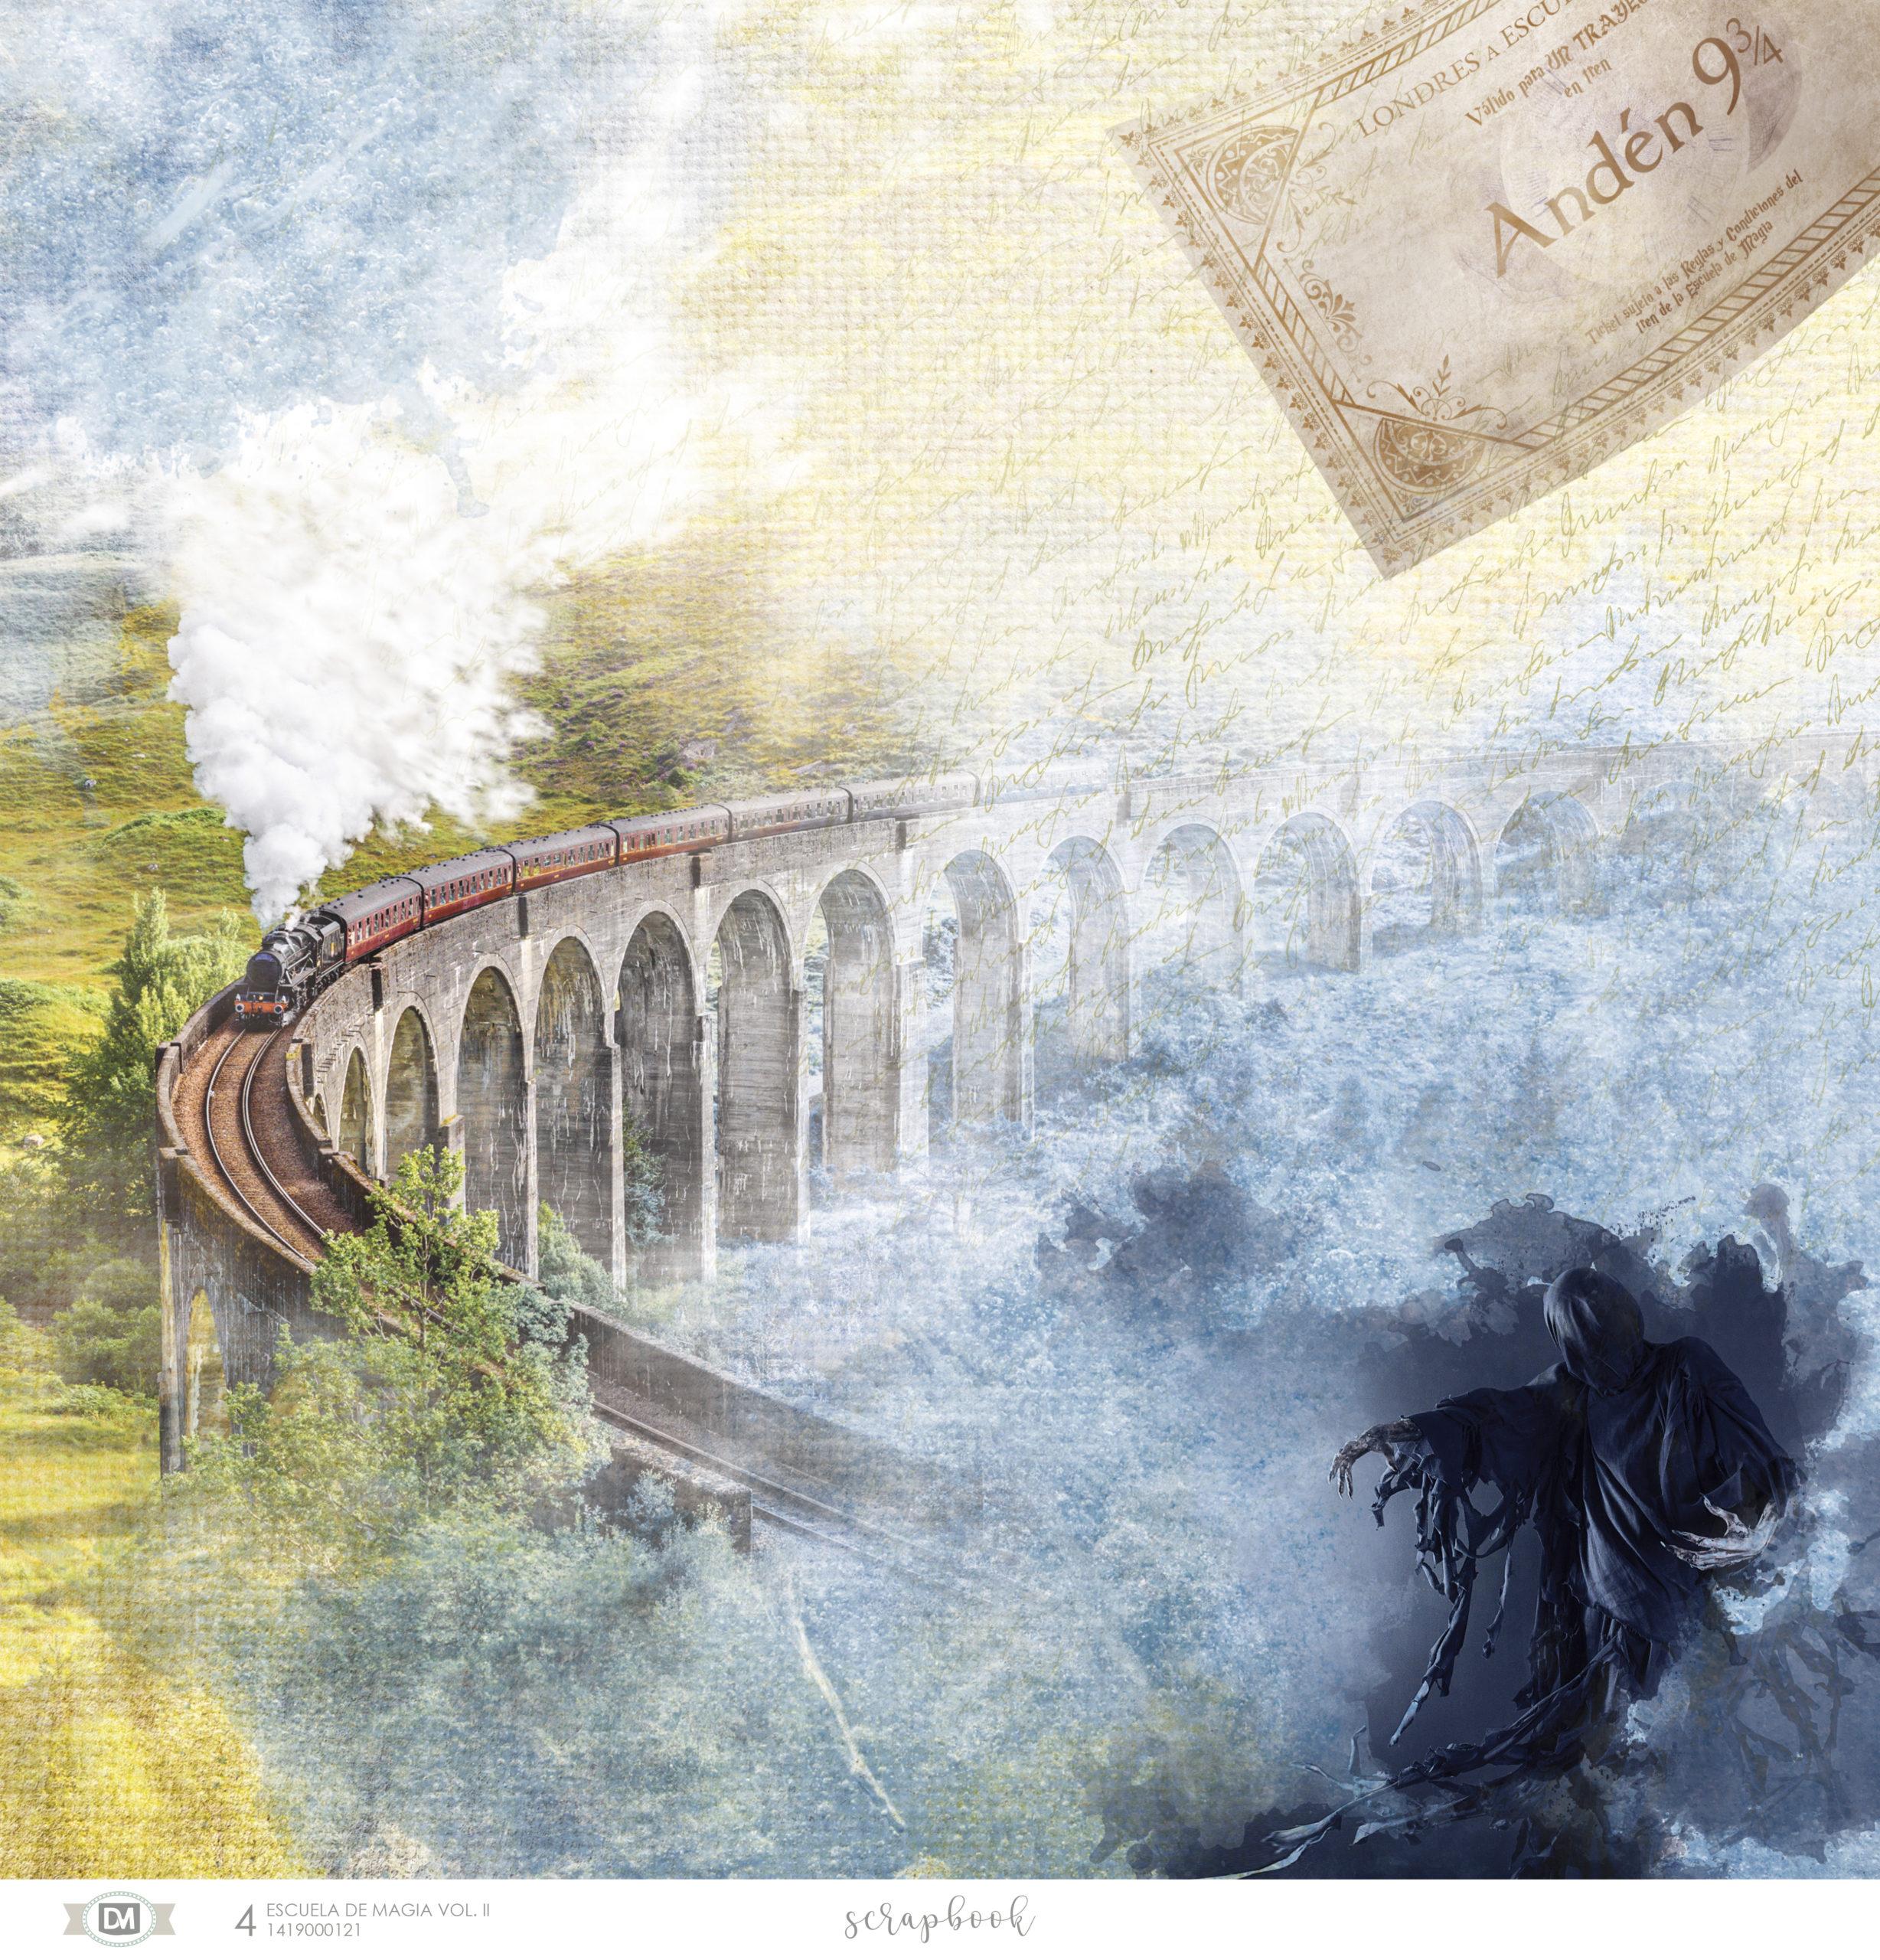 Tren escuela de magia volumen 2